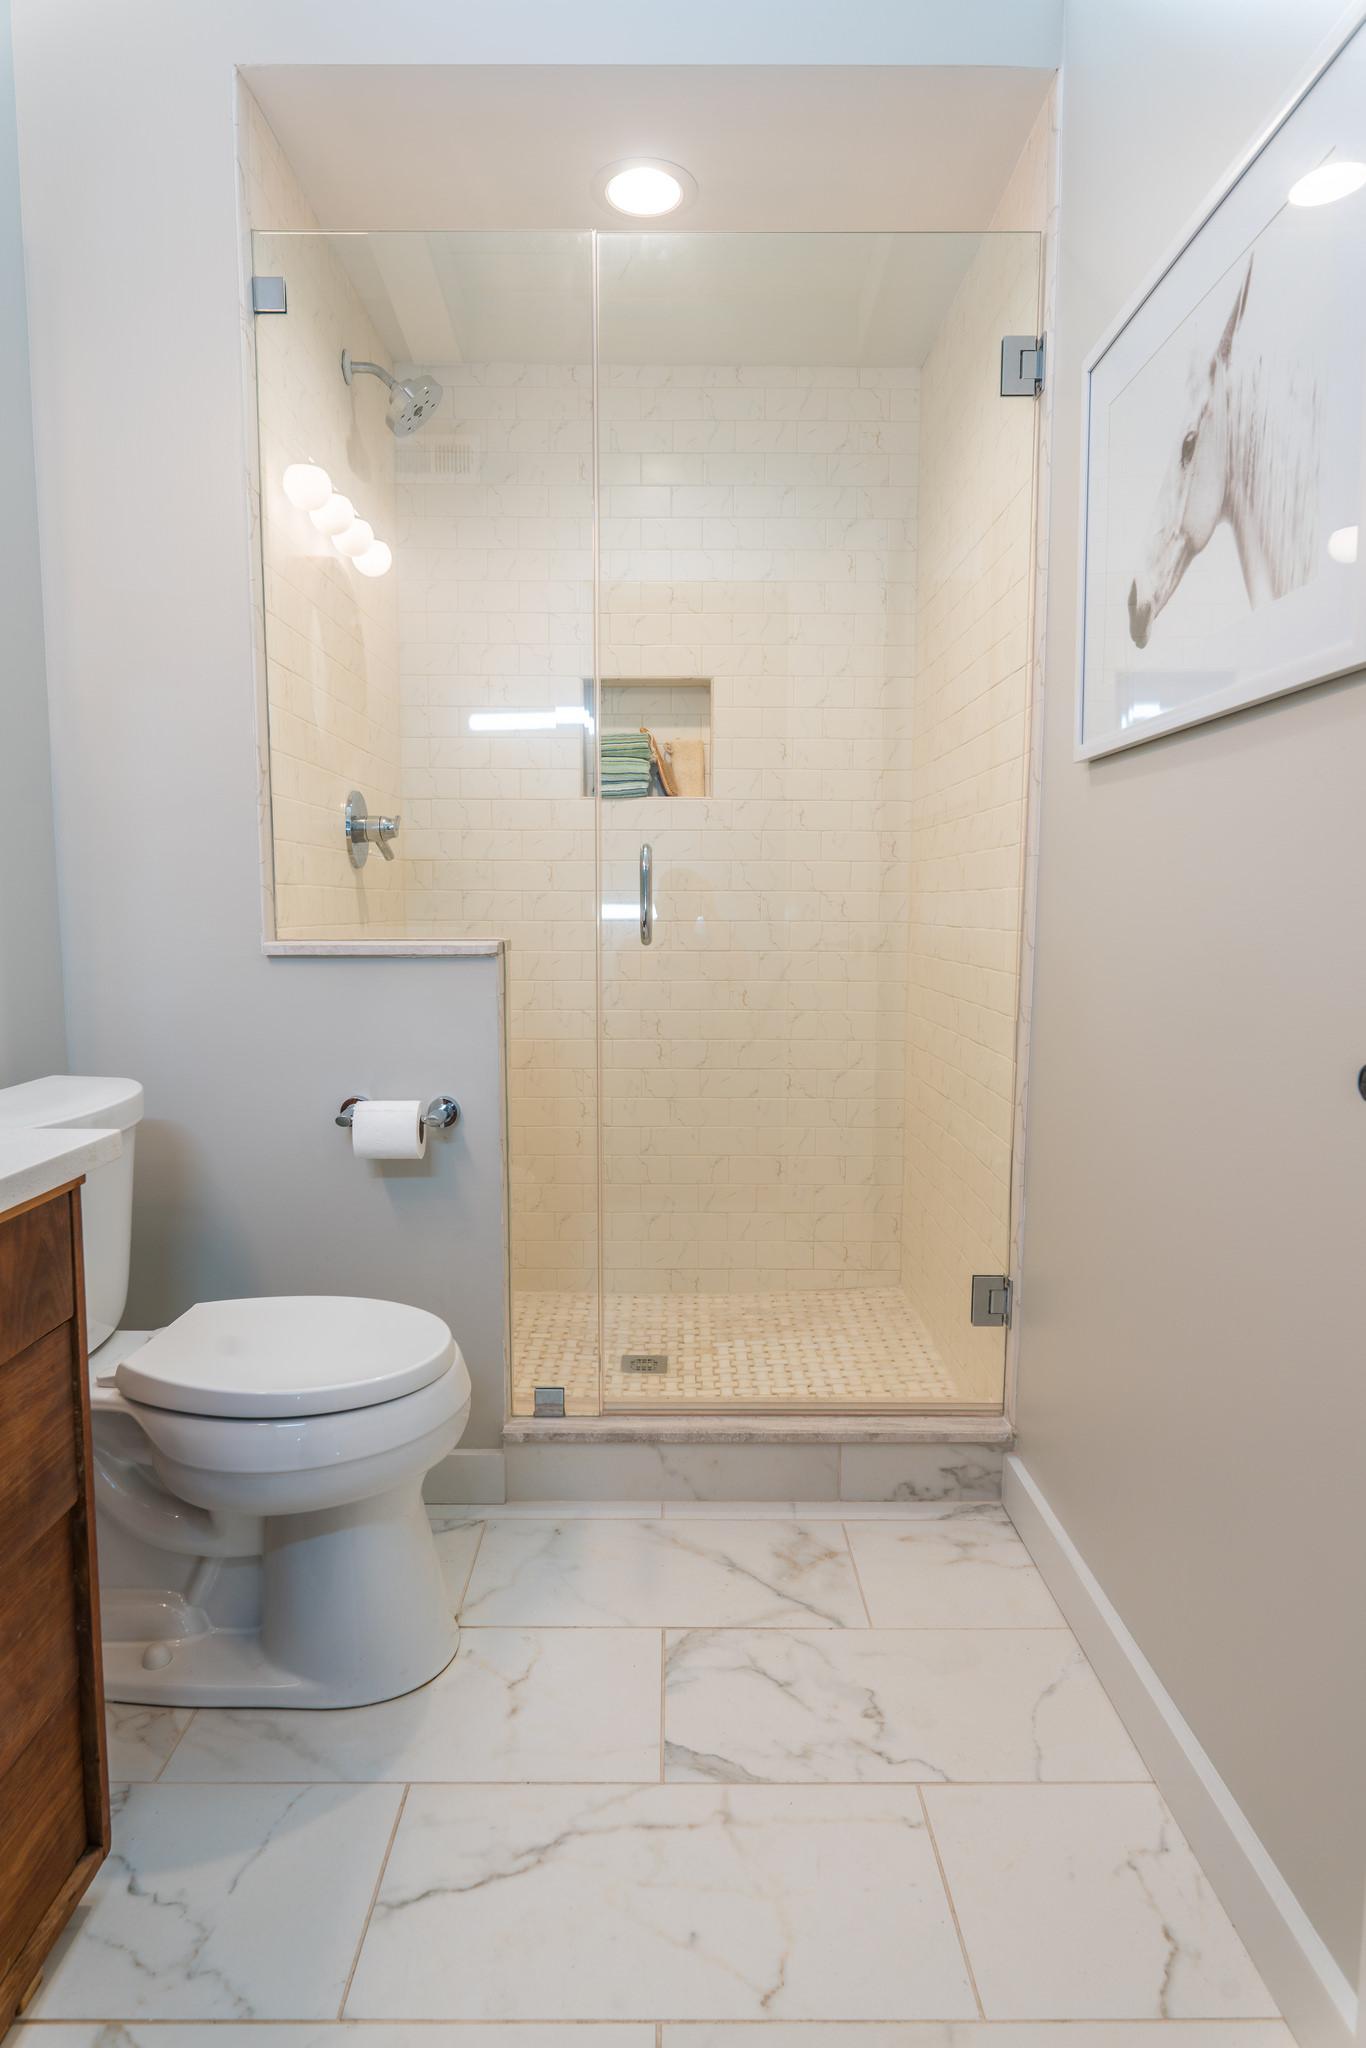 Hall bath with walk-in shower